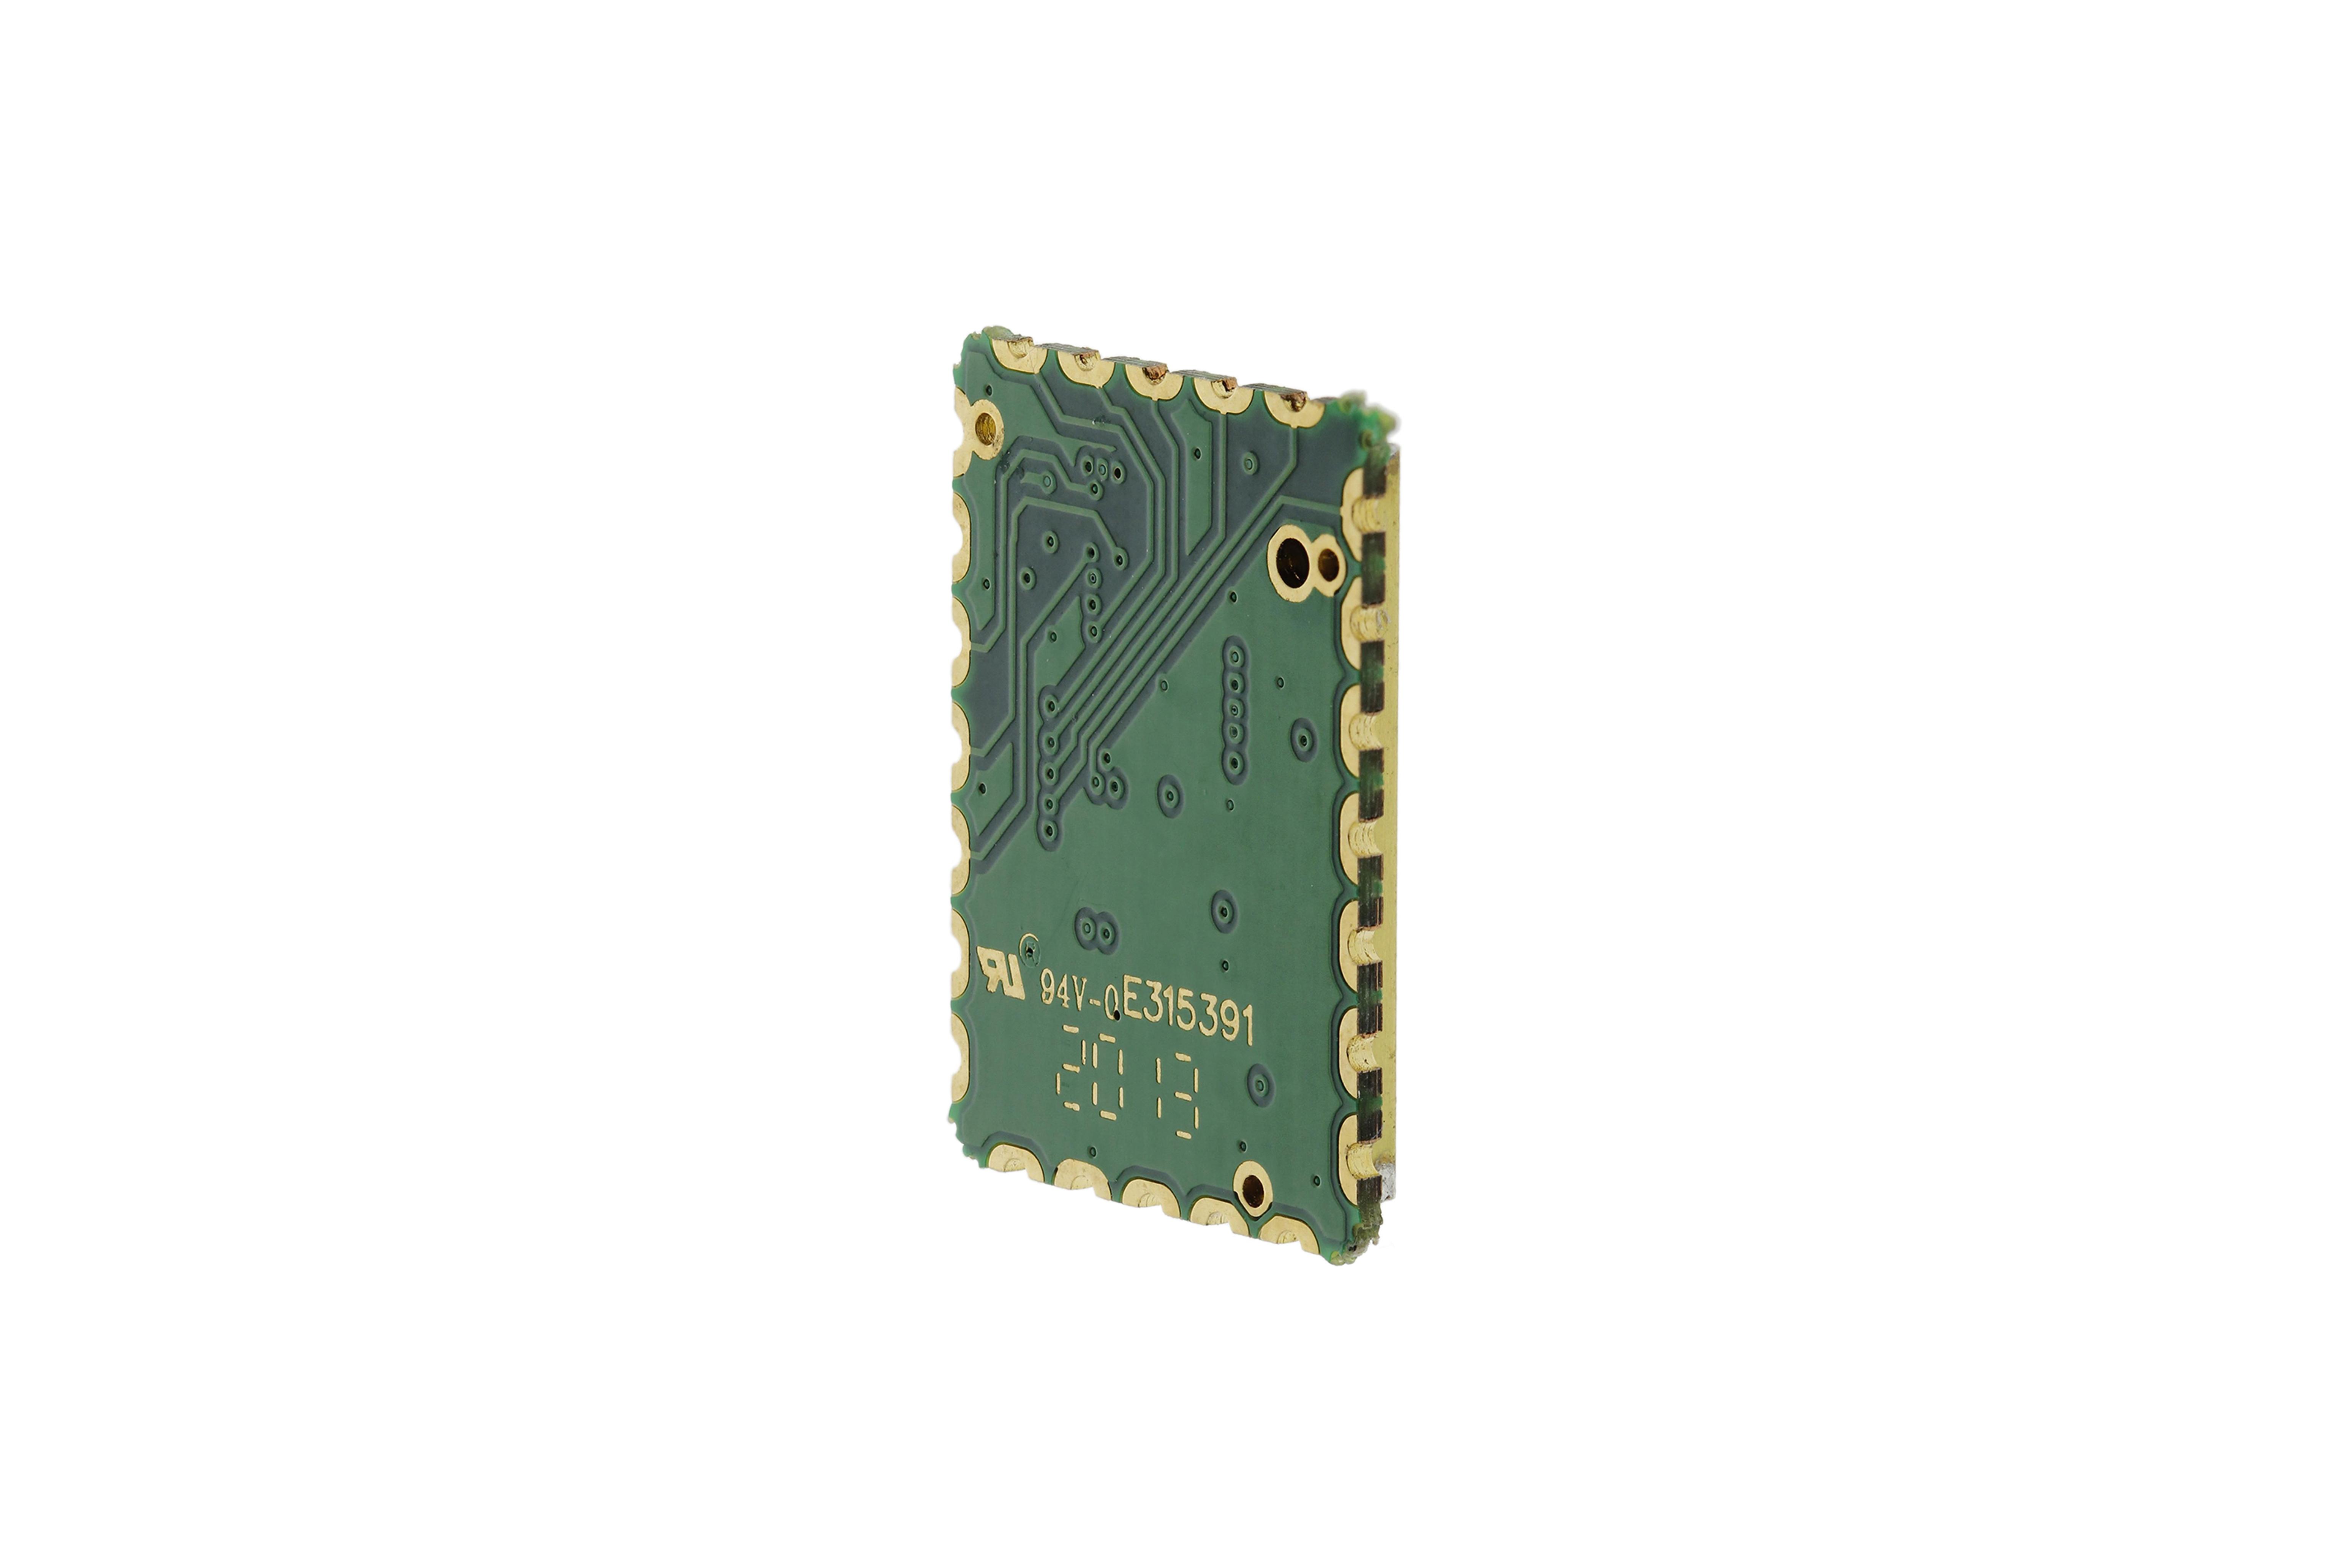 LPRS easyRadio ERIC4 433 MHz HF Transceiver-Modul